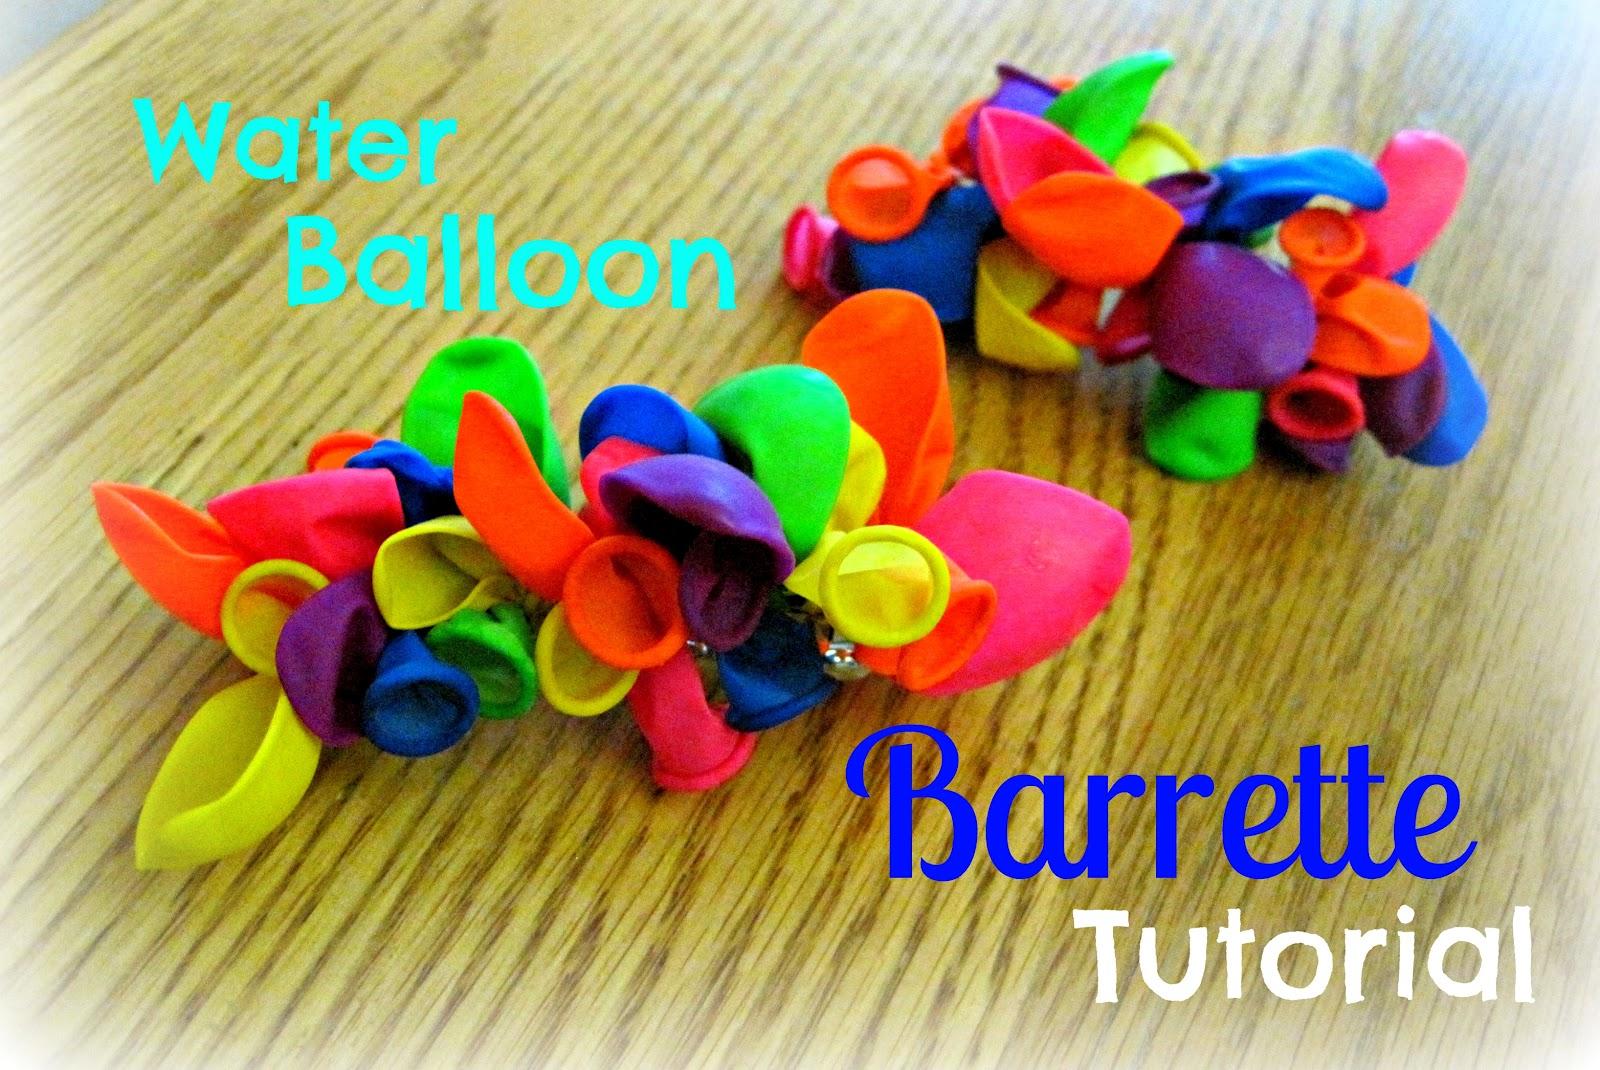 Bake. Make. Create!: Water Balloon Barrette Tutorial